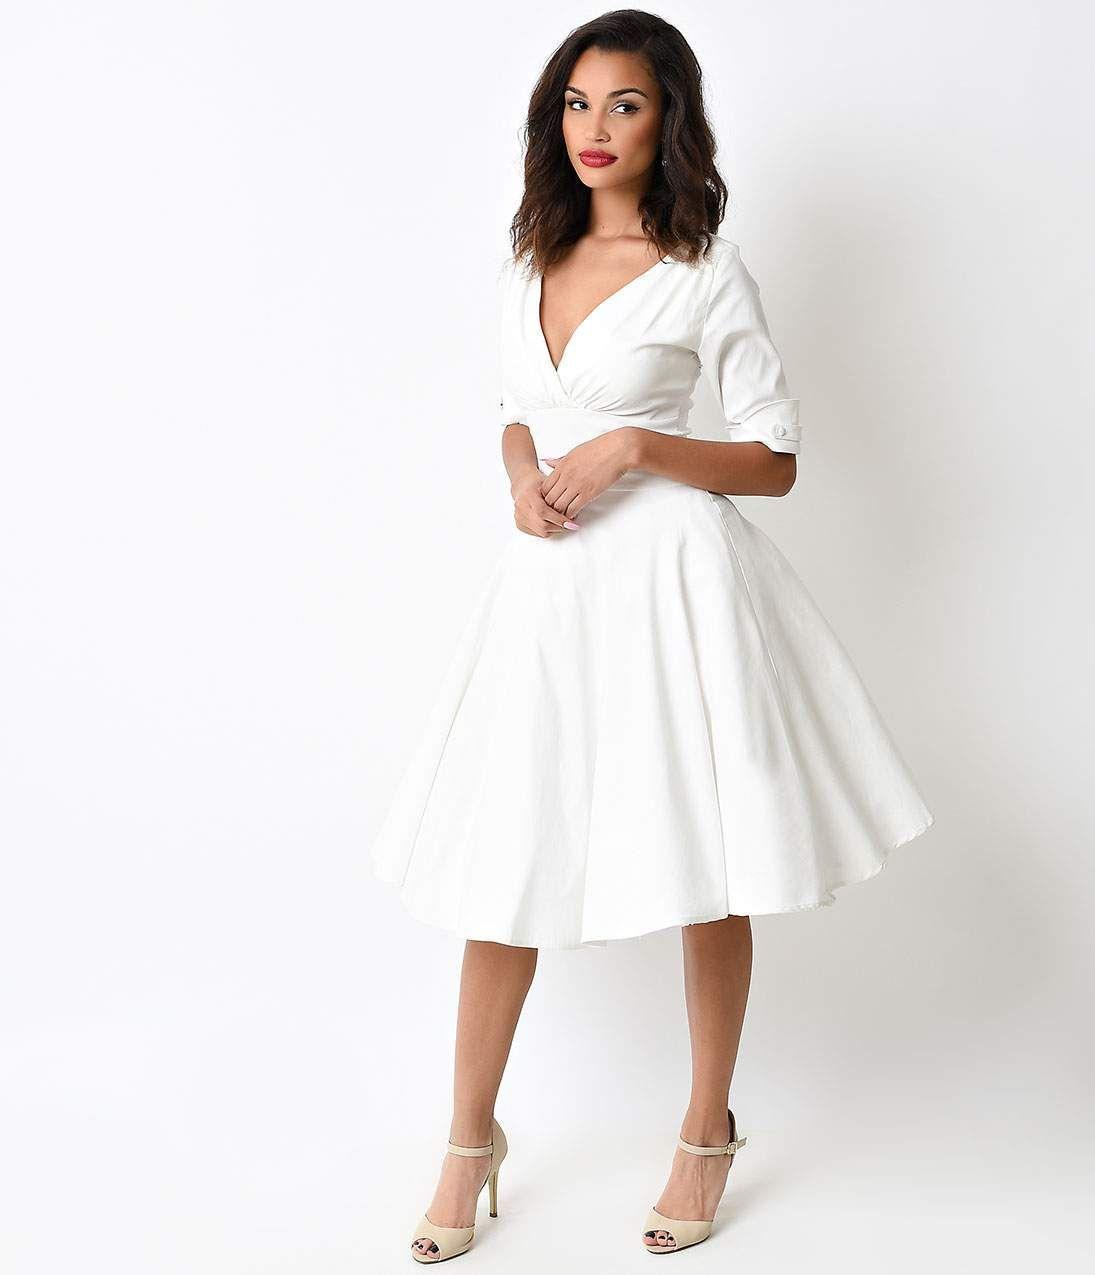 Unique style wedding dresses  s Wedding Dress s Style Wedding Dresses Rockabilly Weddings